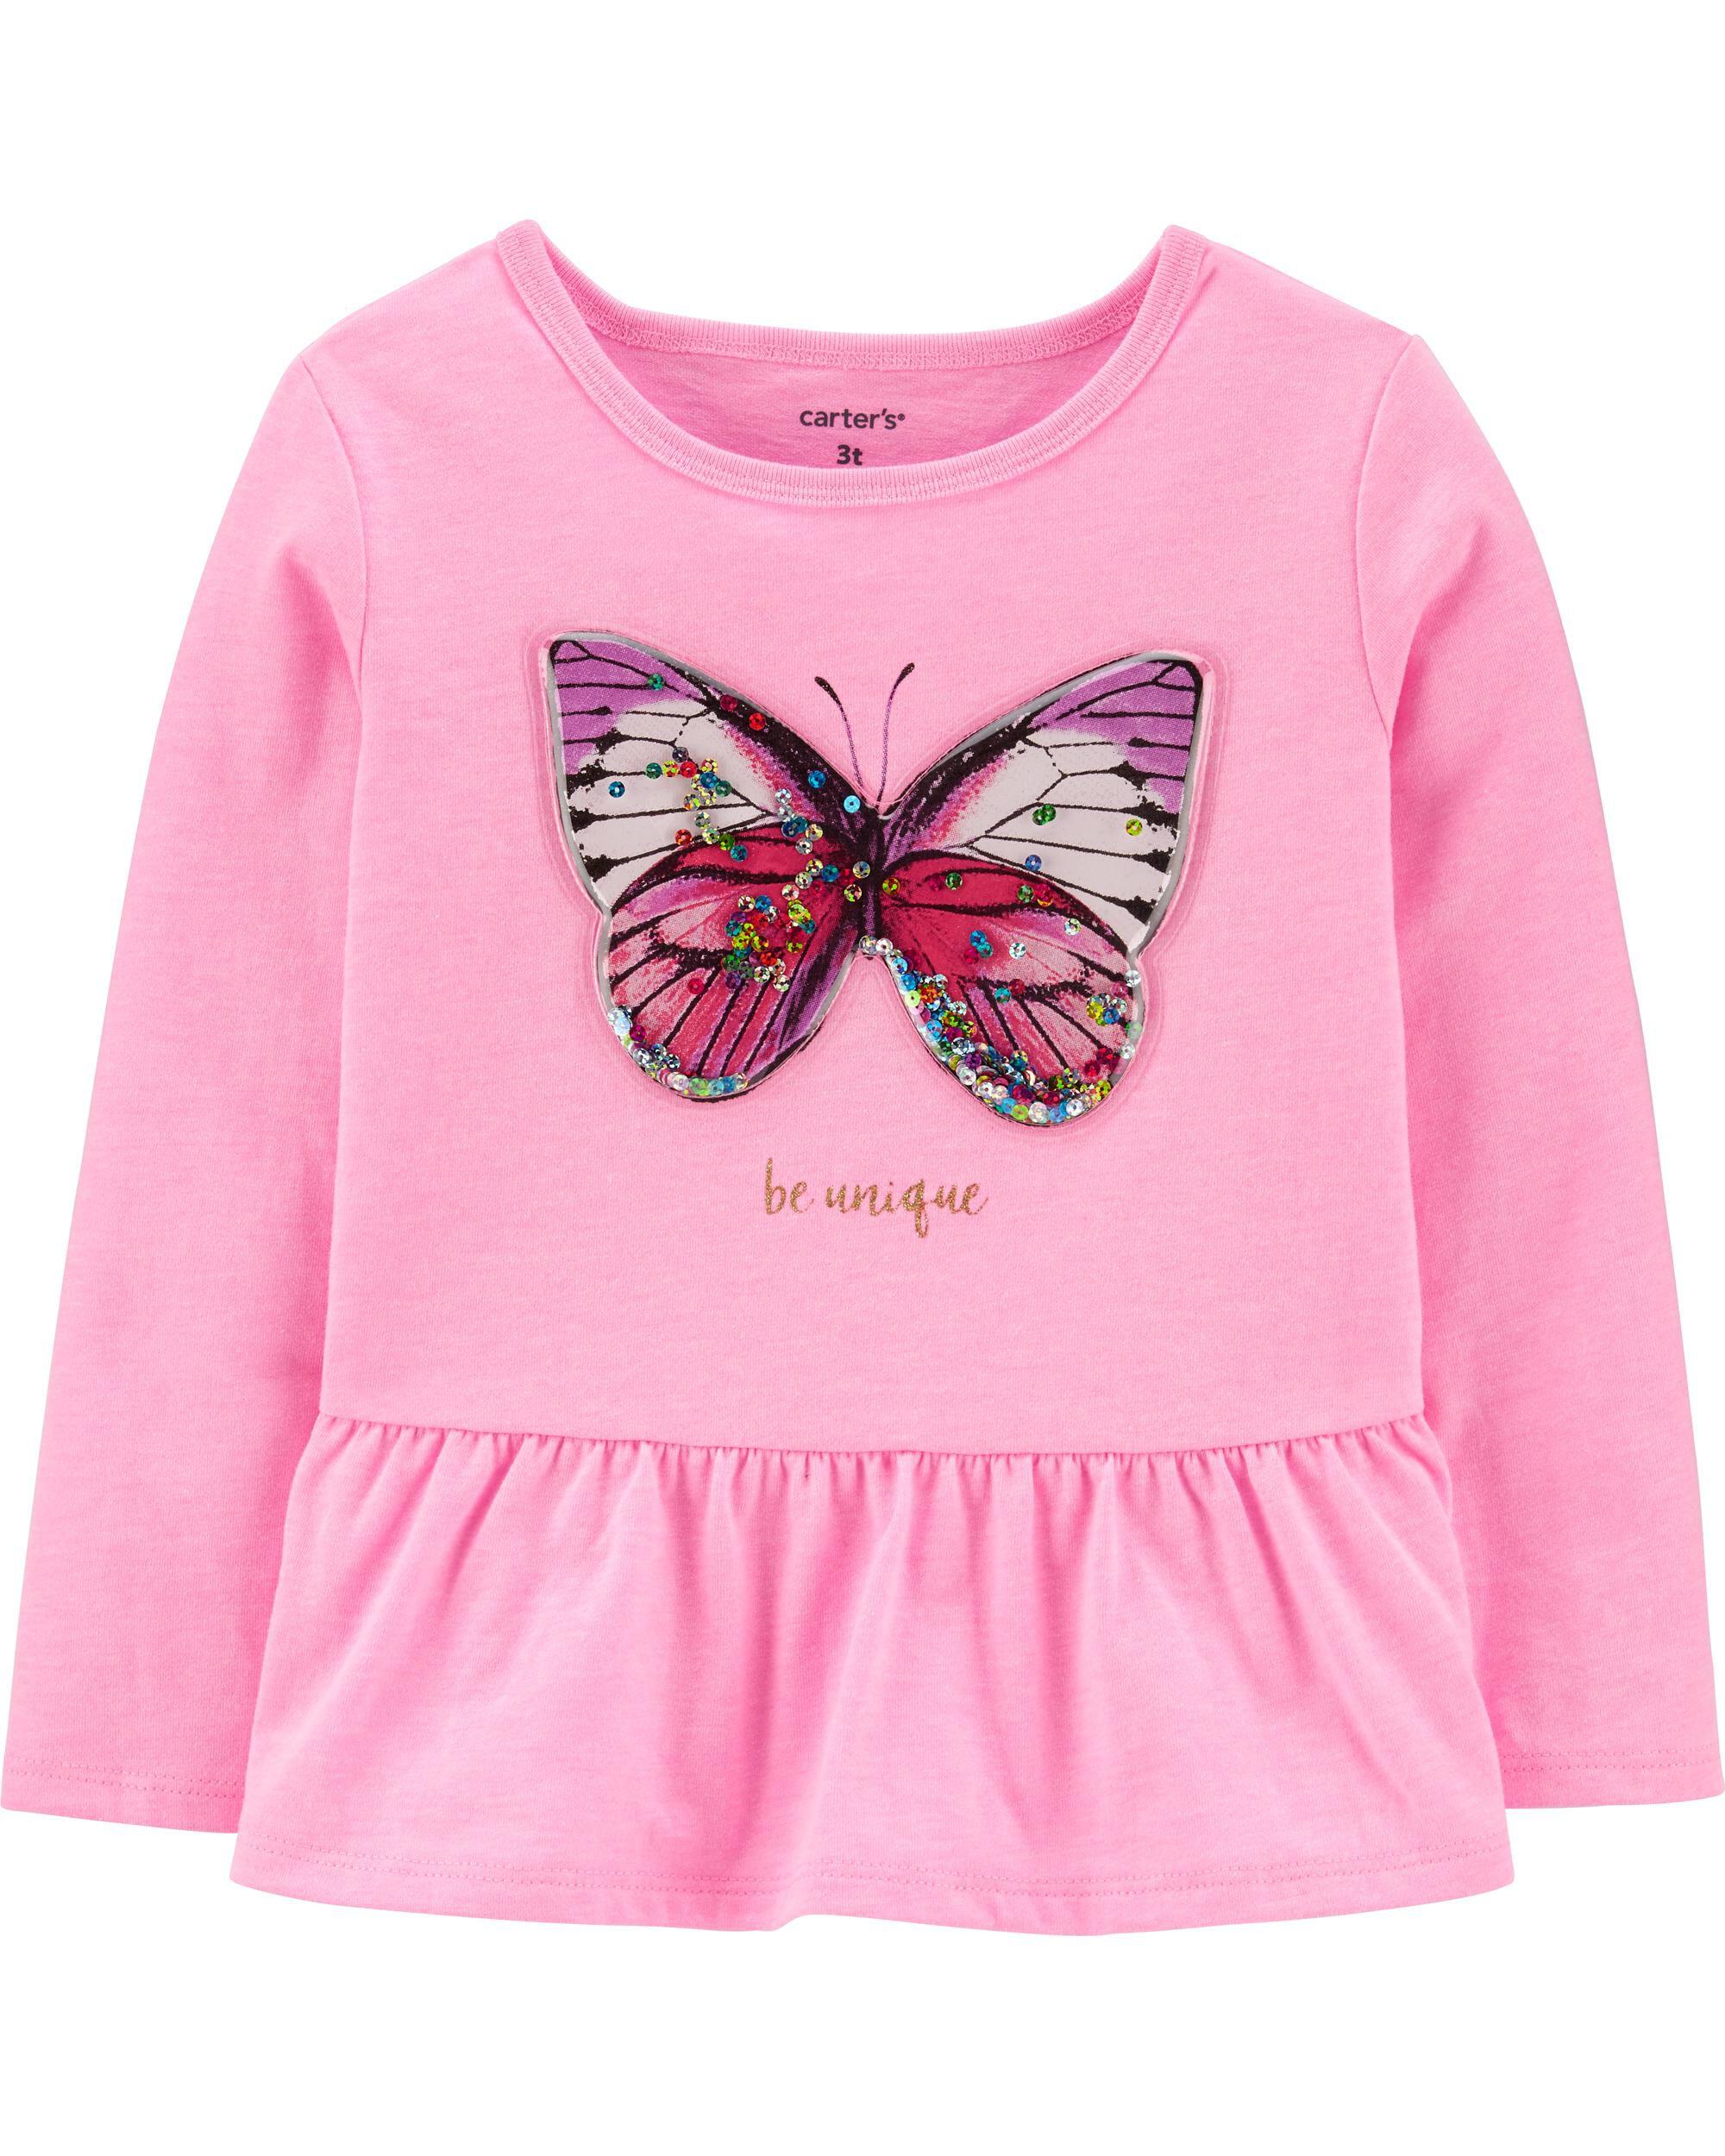 *CLEARANCE* Neon Interactive Butterfly Peplum Top